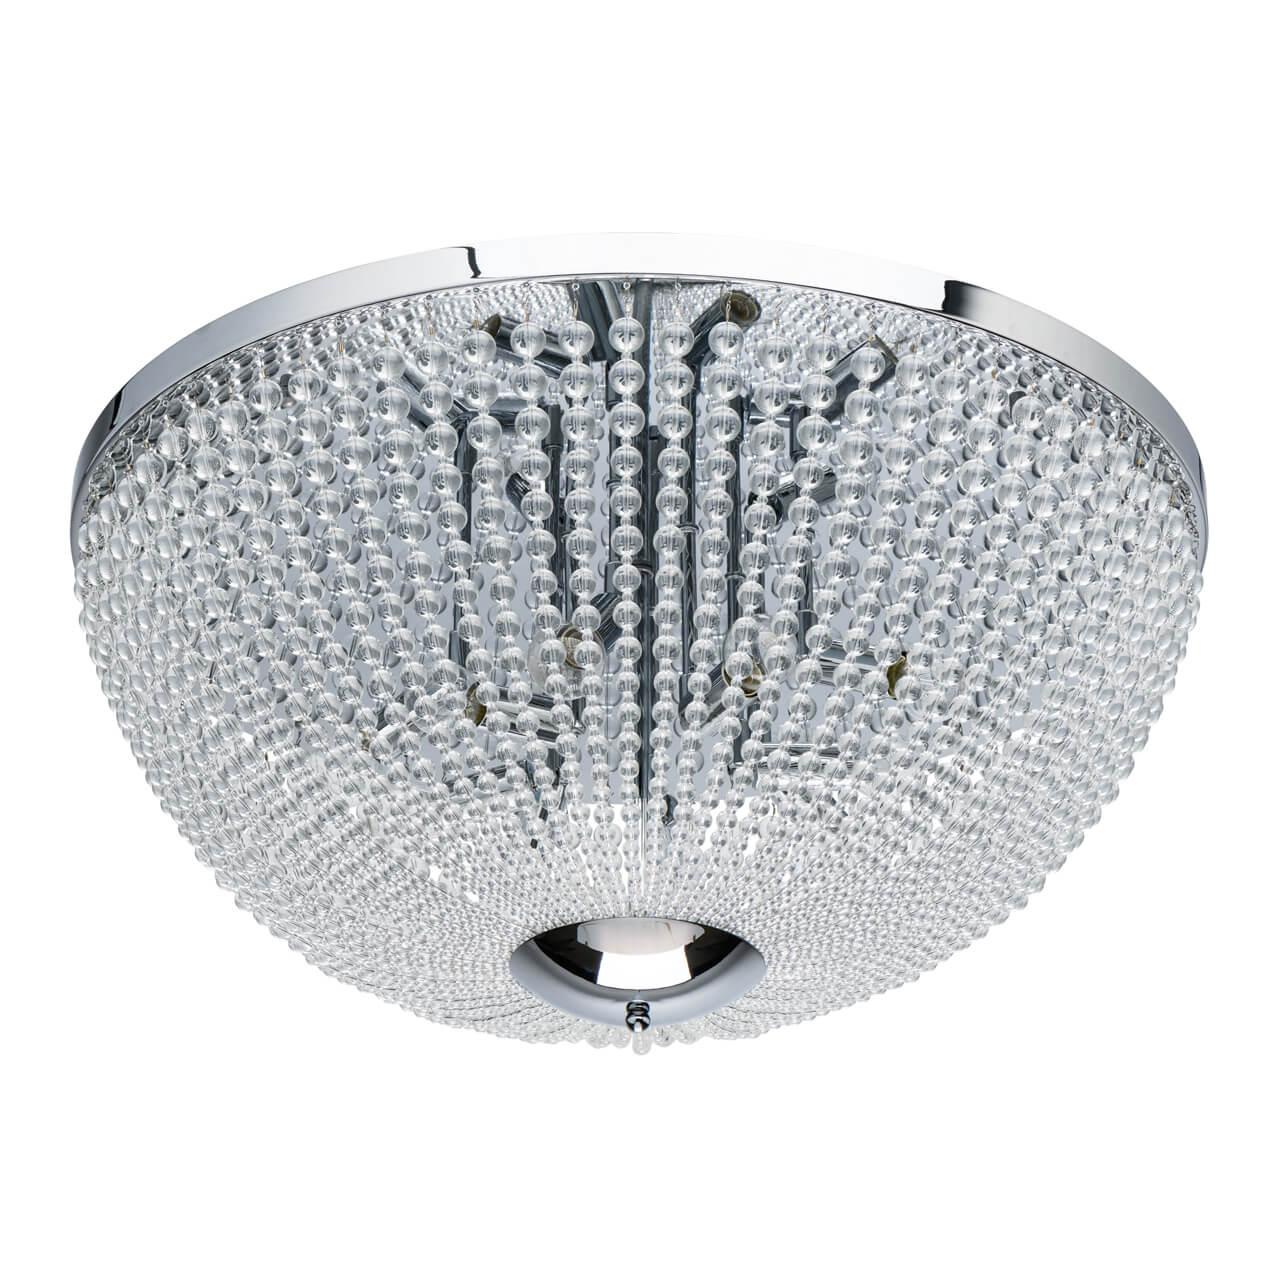 Люстра MW-Light 111012510 Бриз mw light потолочная люстра mw light бриз 464018309